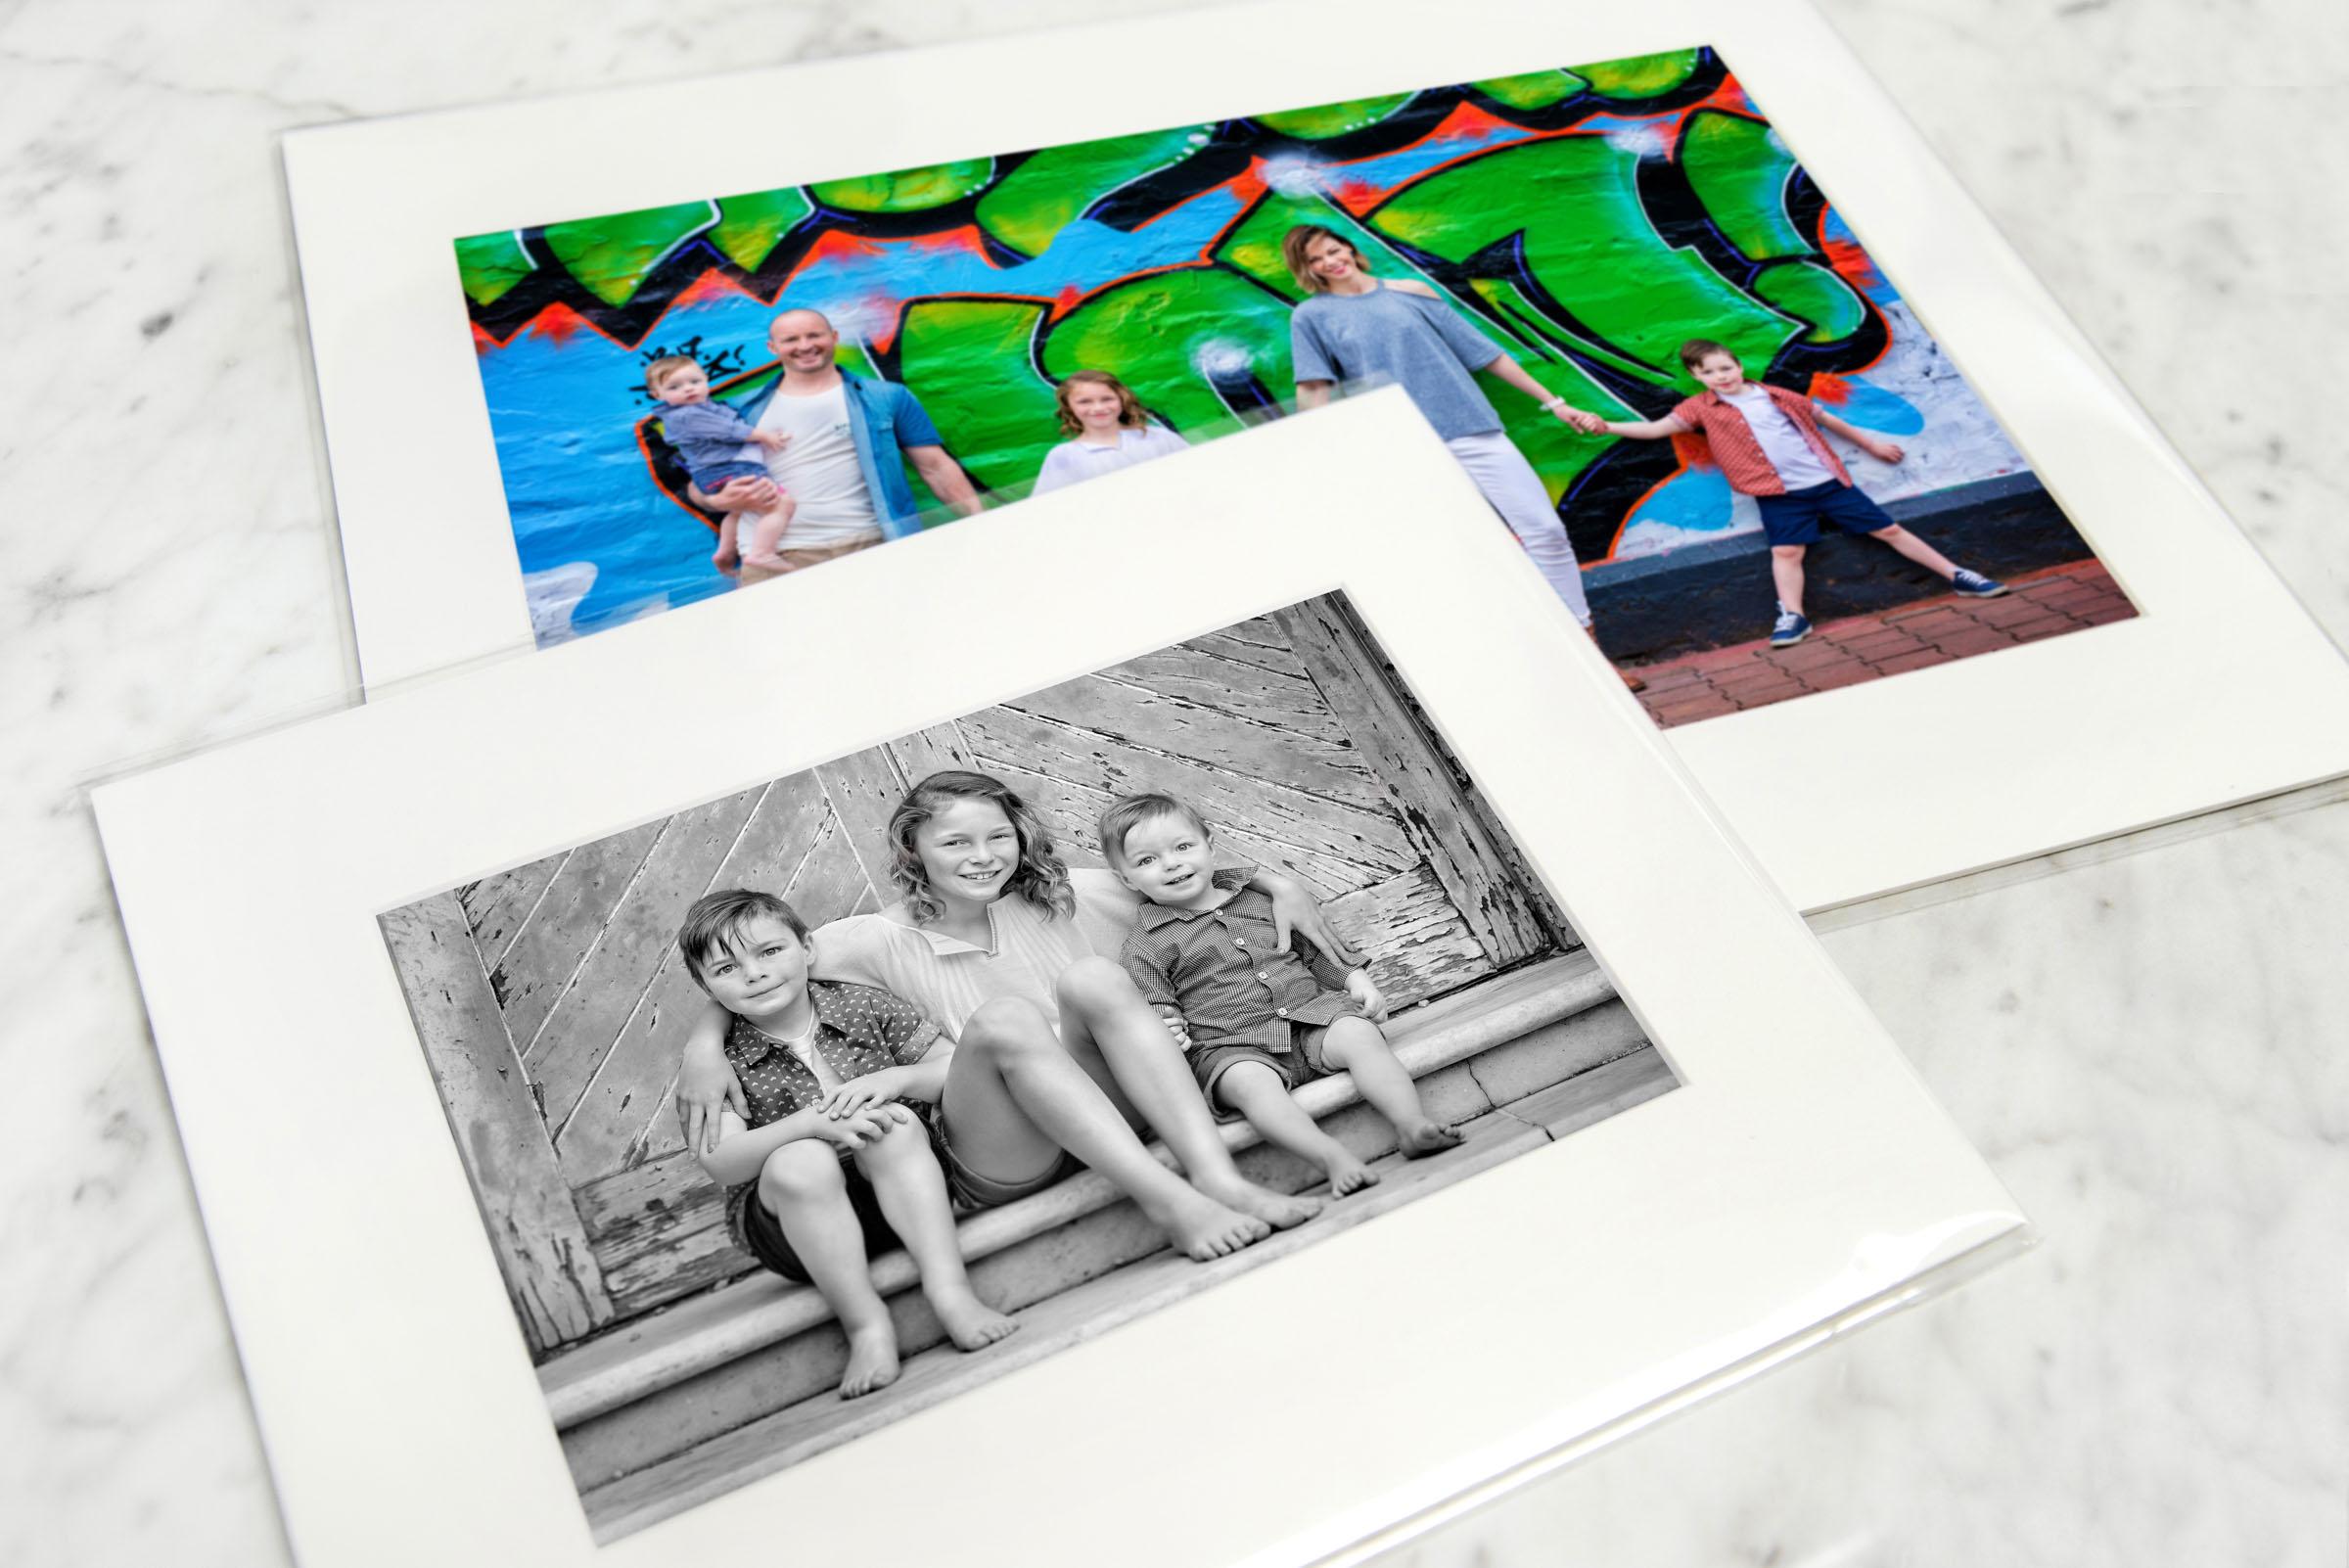 album photo print printing mat matted usb digital sa adelaide photographer photography_004.jpg